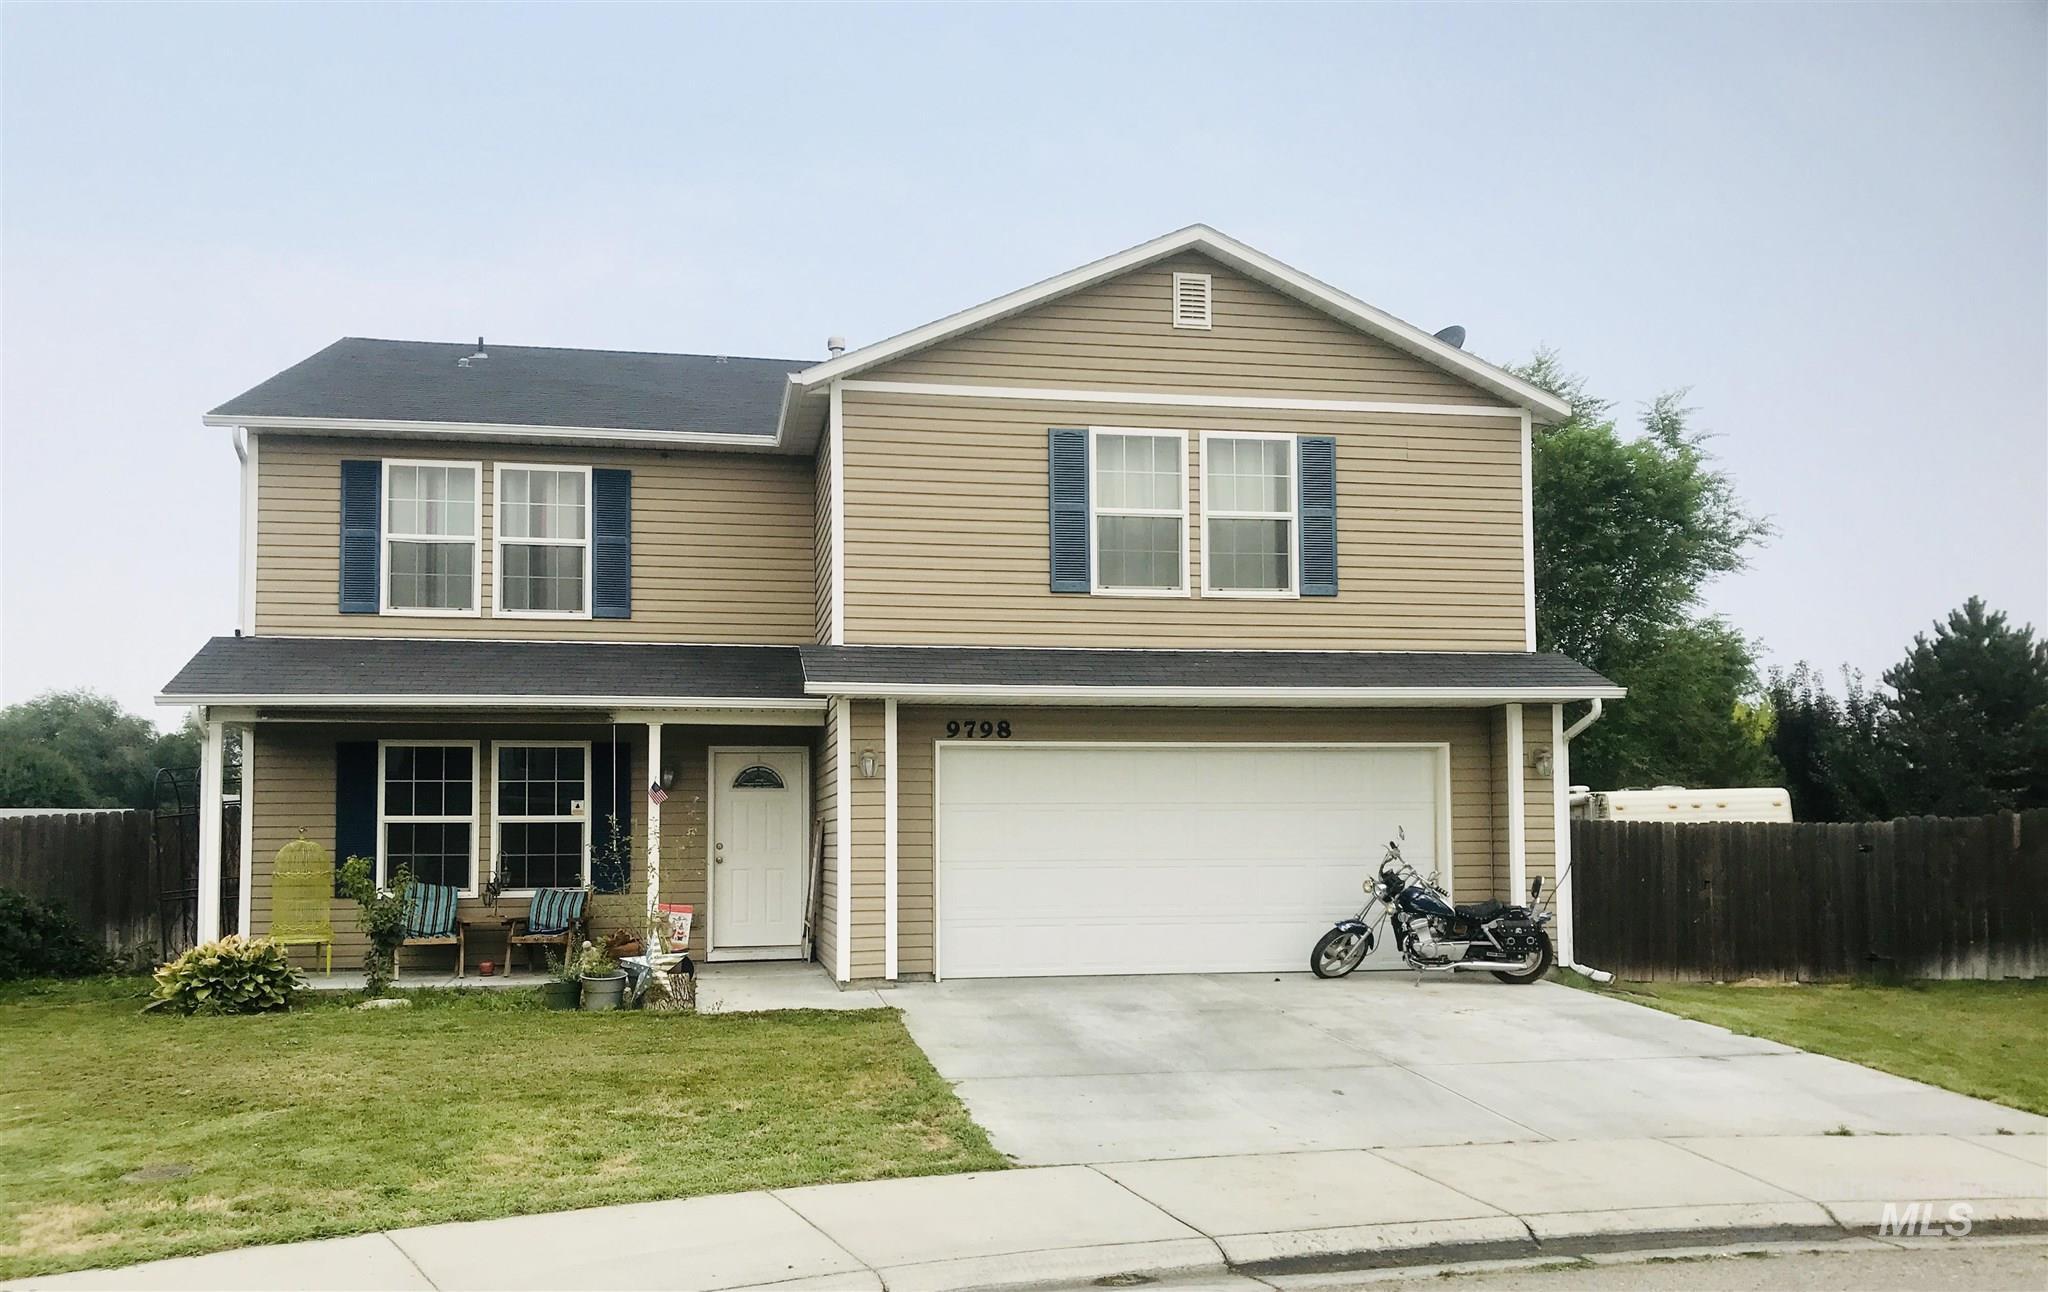 9798 W Hearthside Property Photo